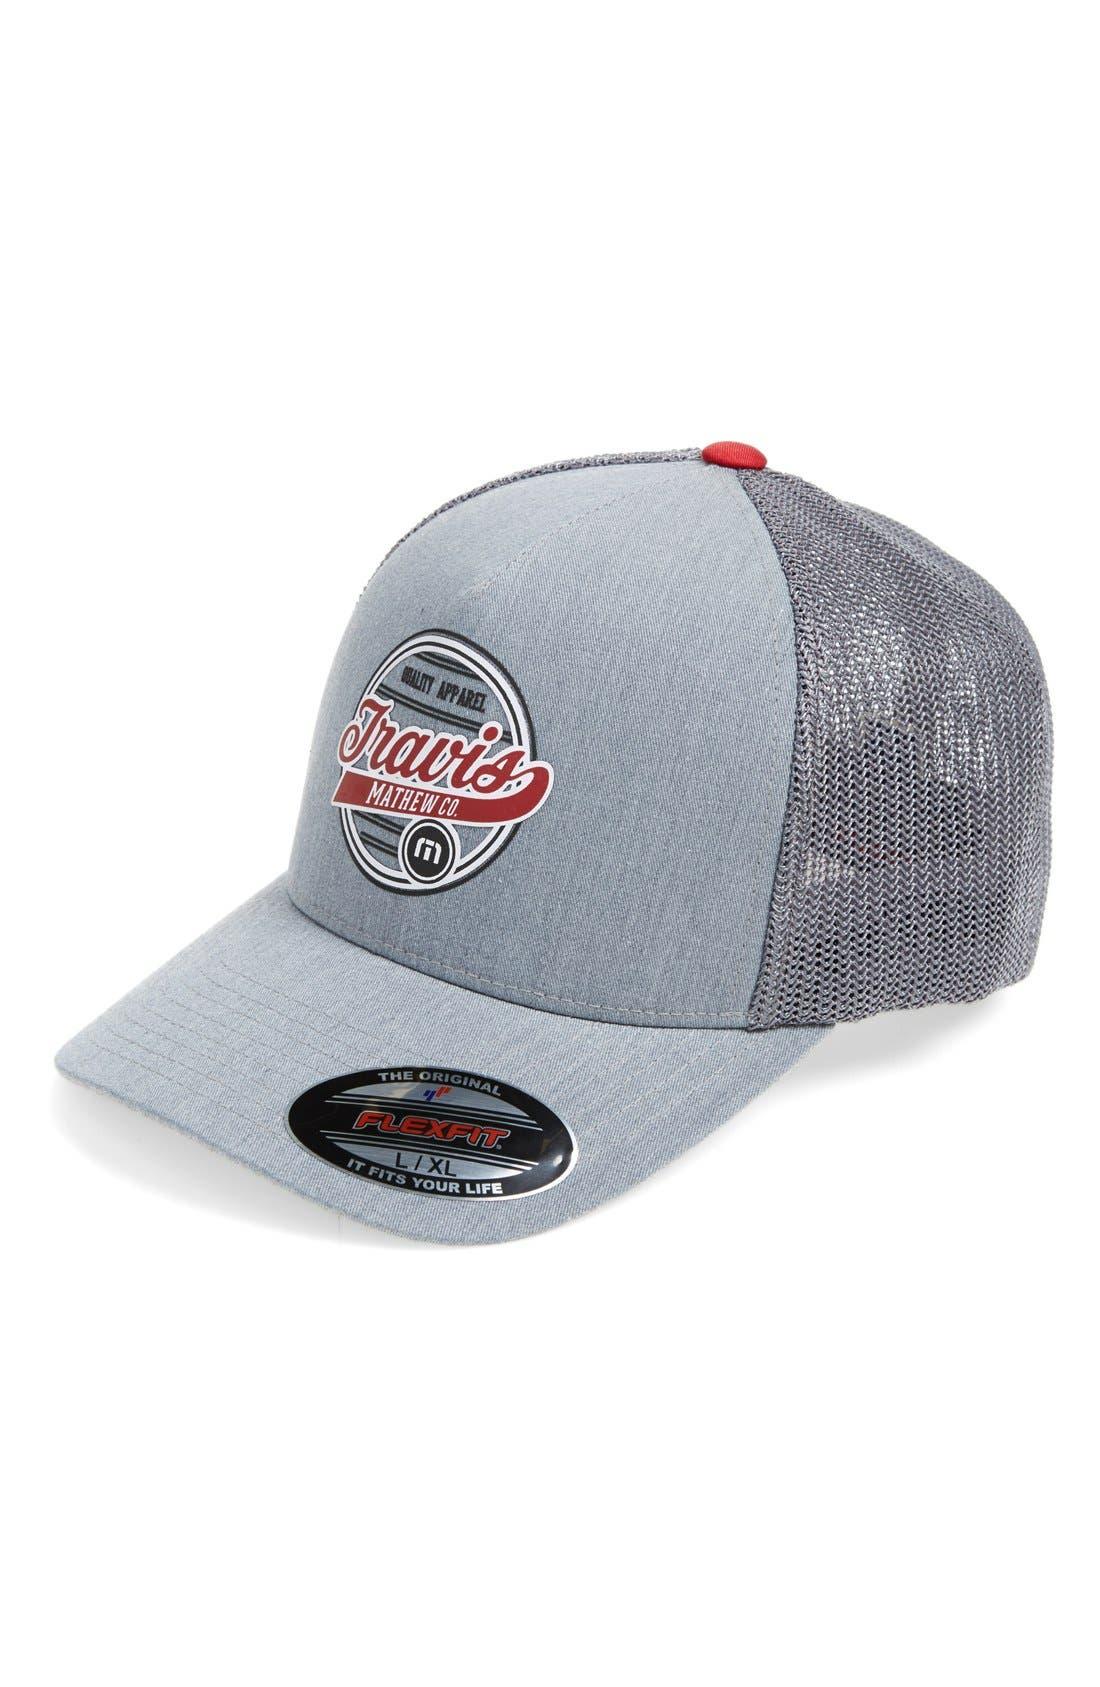 Main Image - Travis Mathew 'Cloon' Trucker Hat